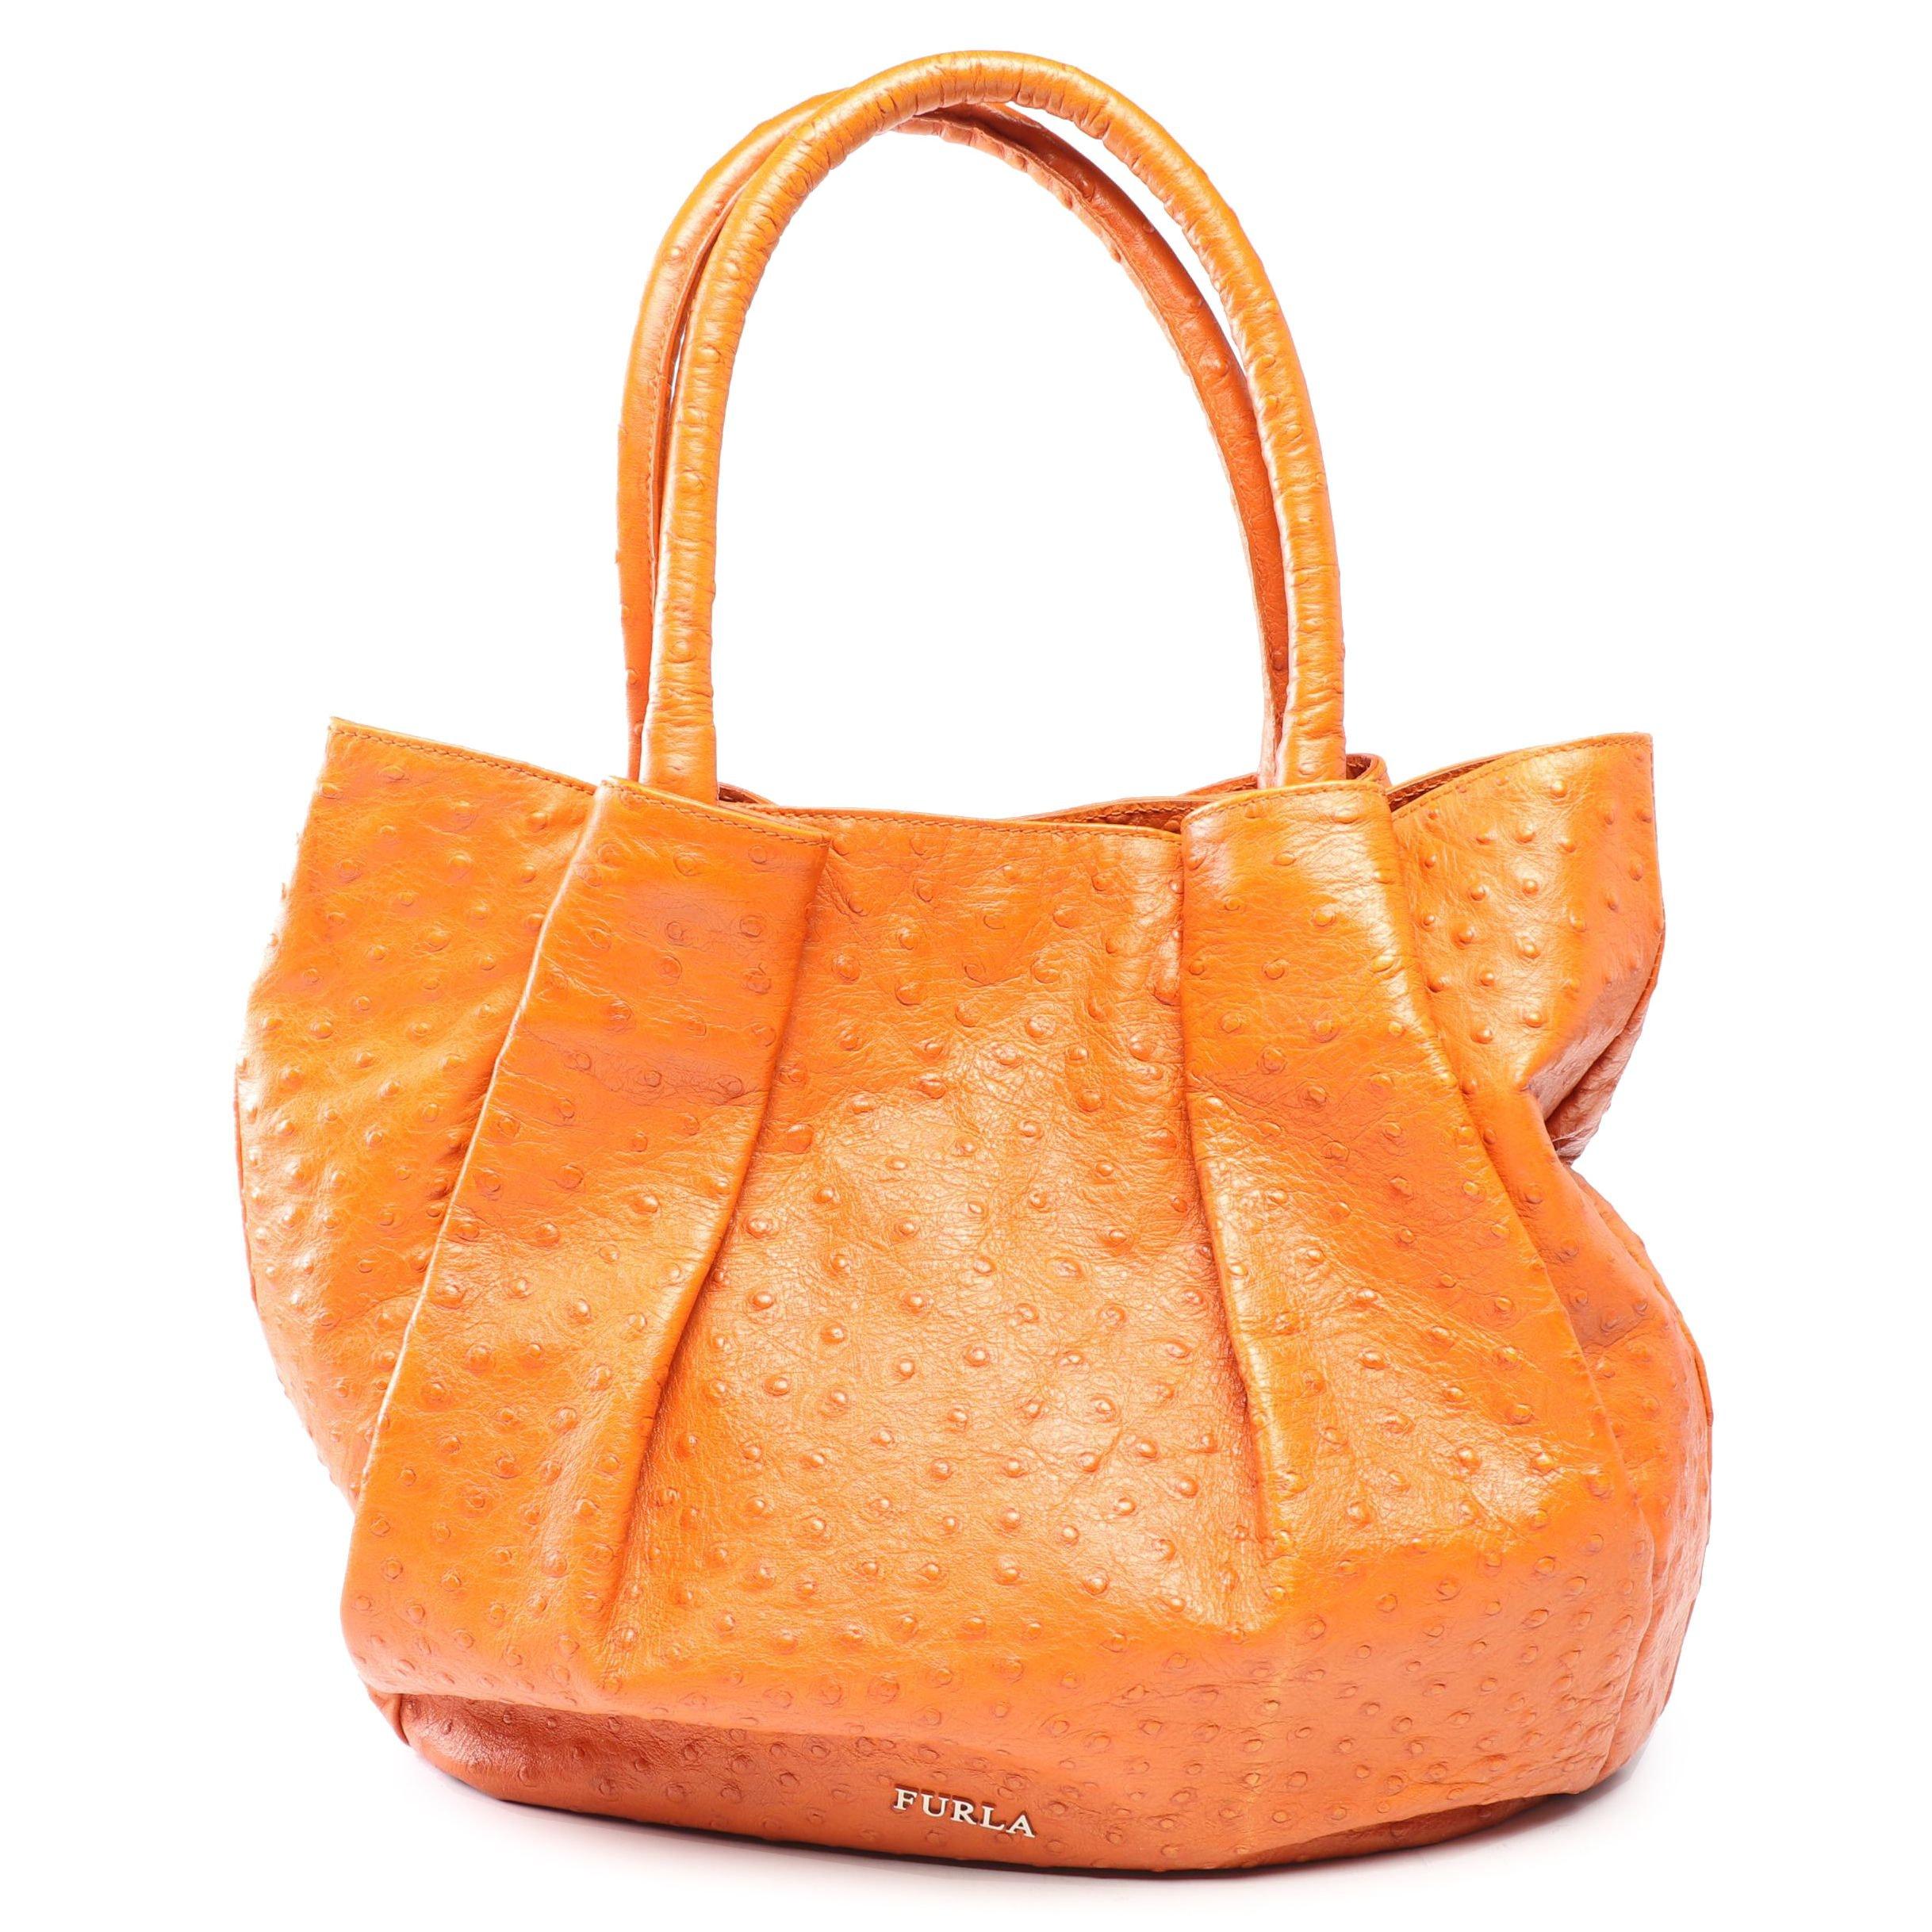 Furla Ostrich Embossed Orange Leather Handbag, Made in Italy